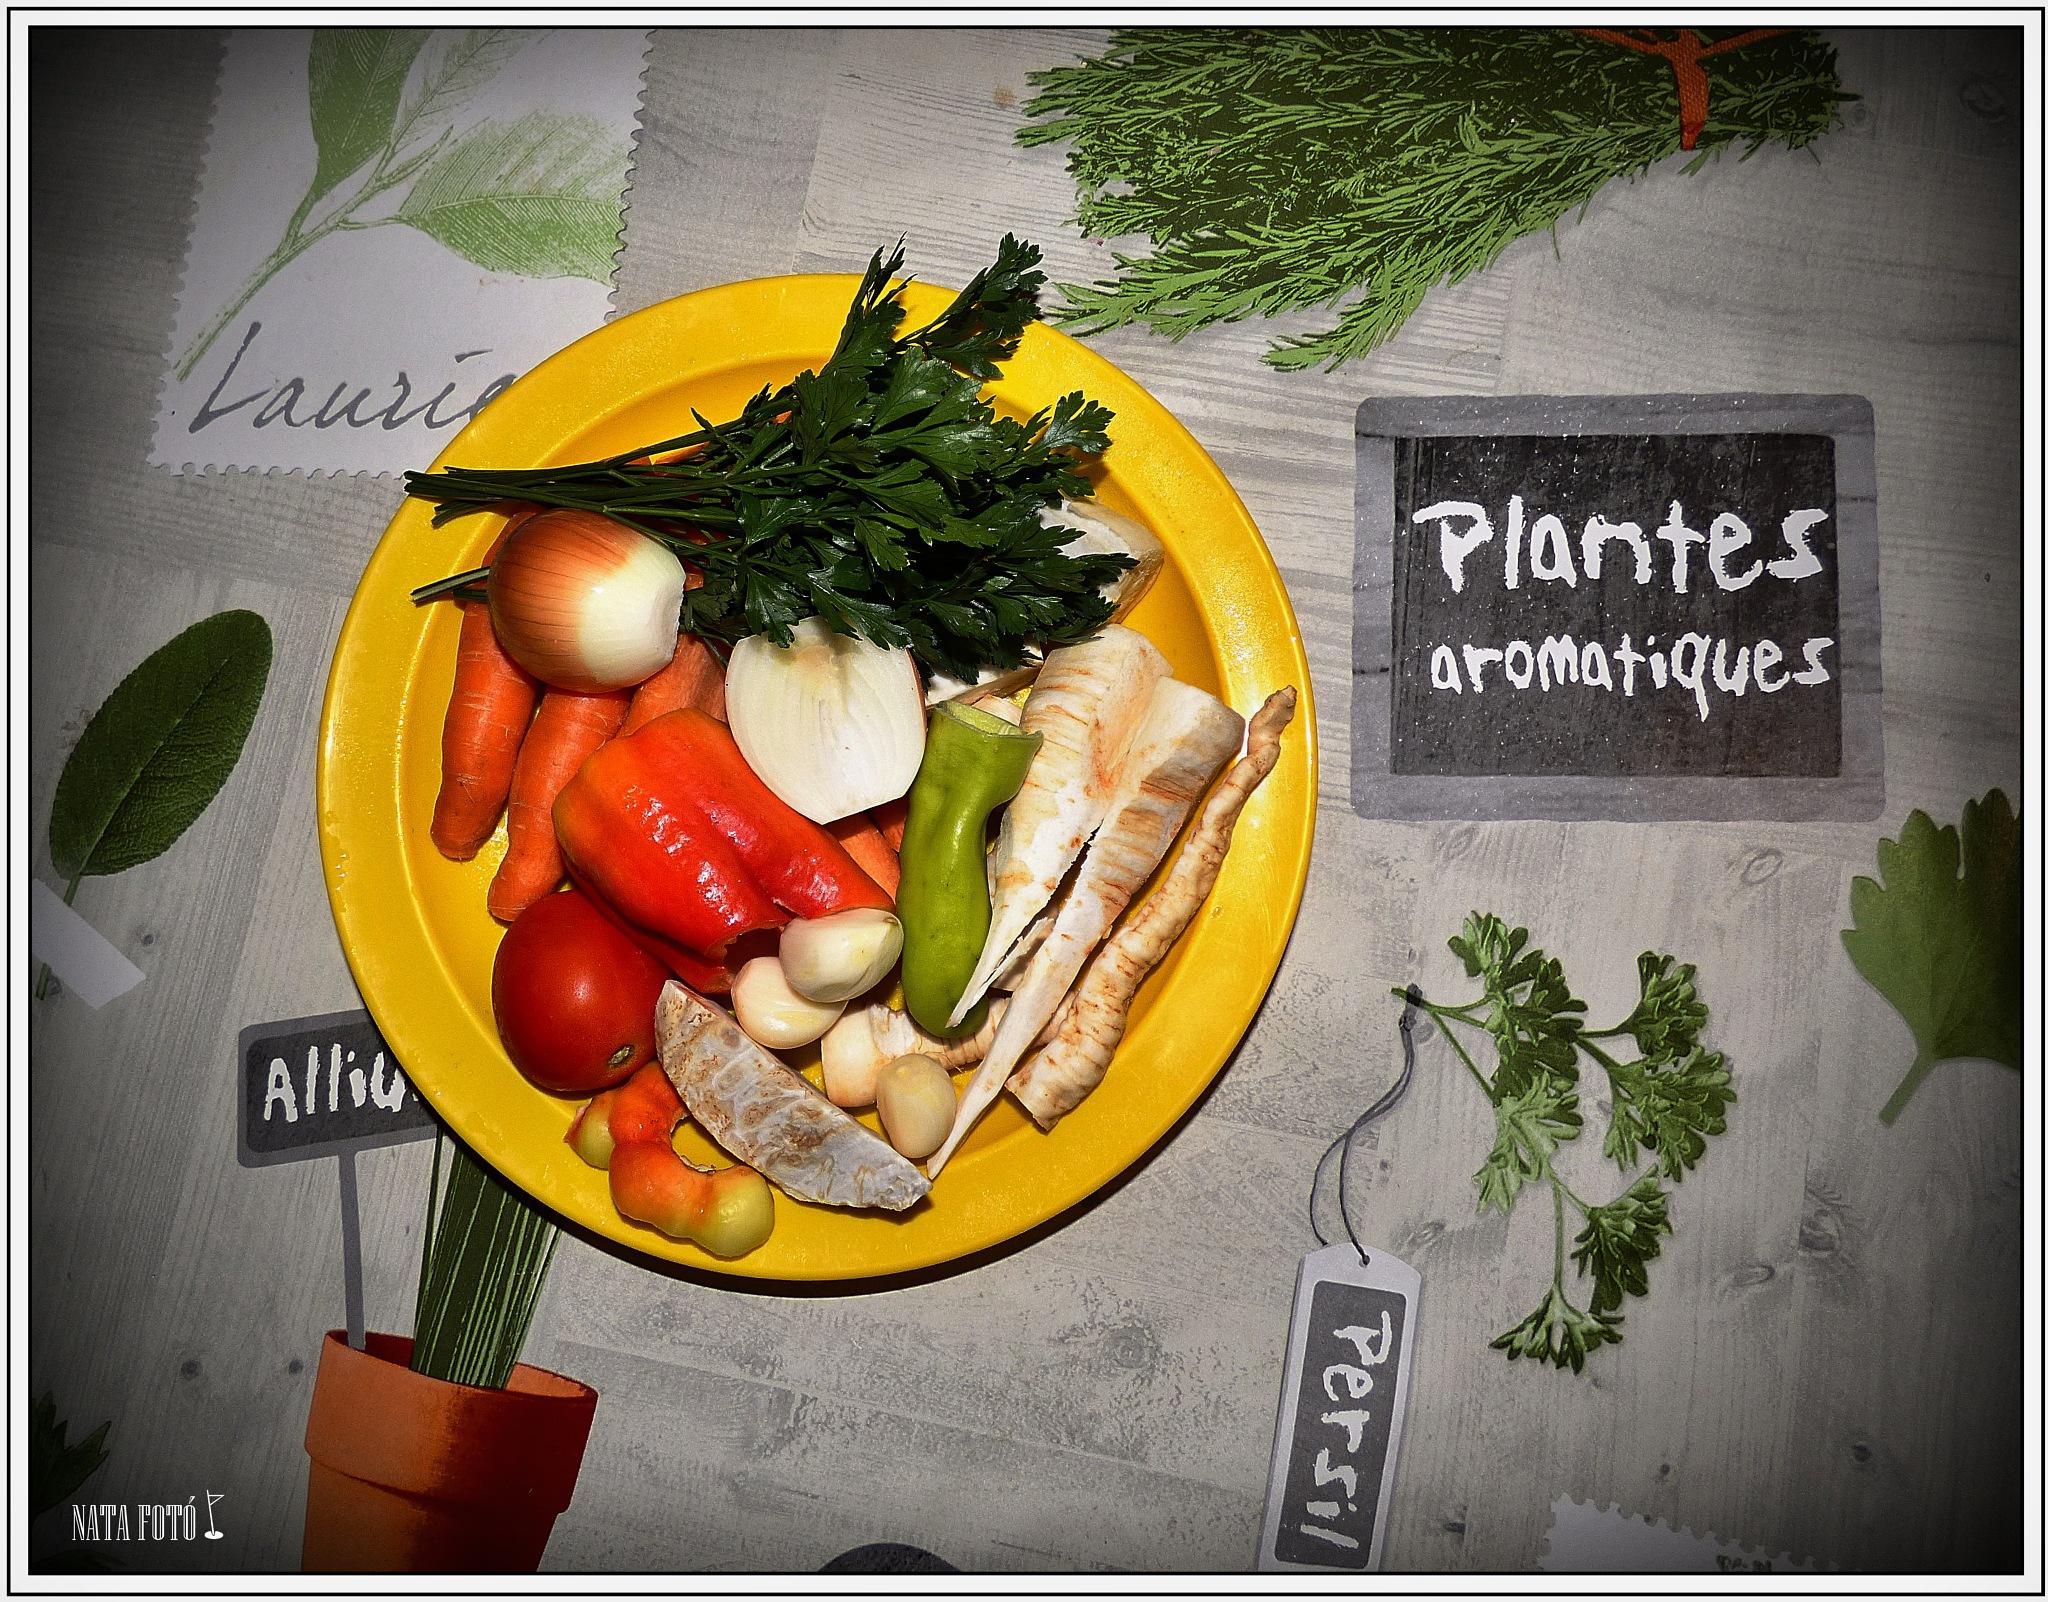 Plantes aromatiques by Nata